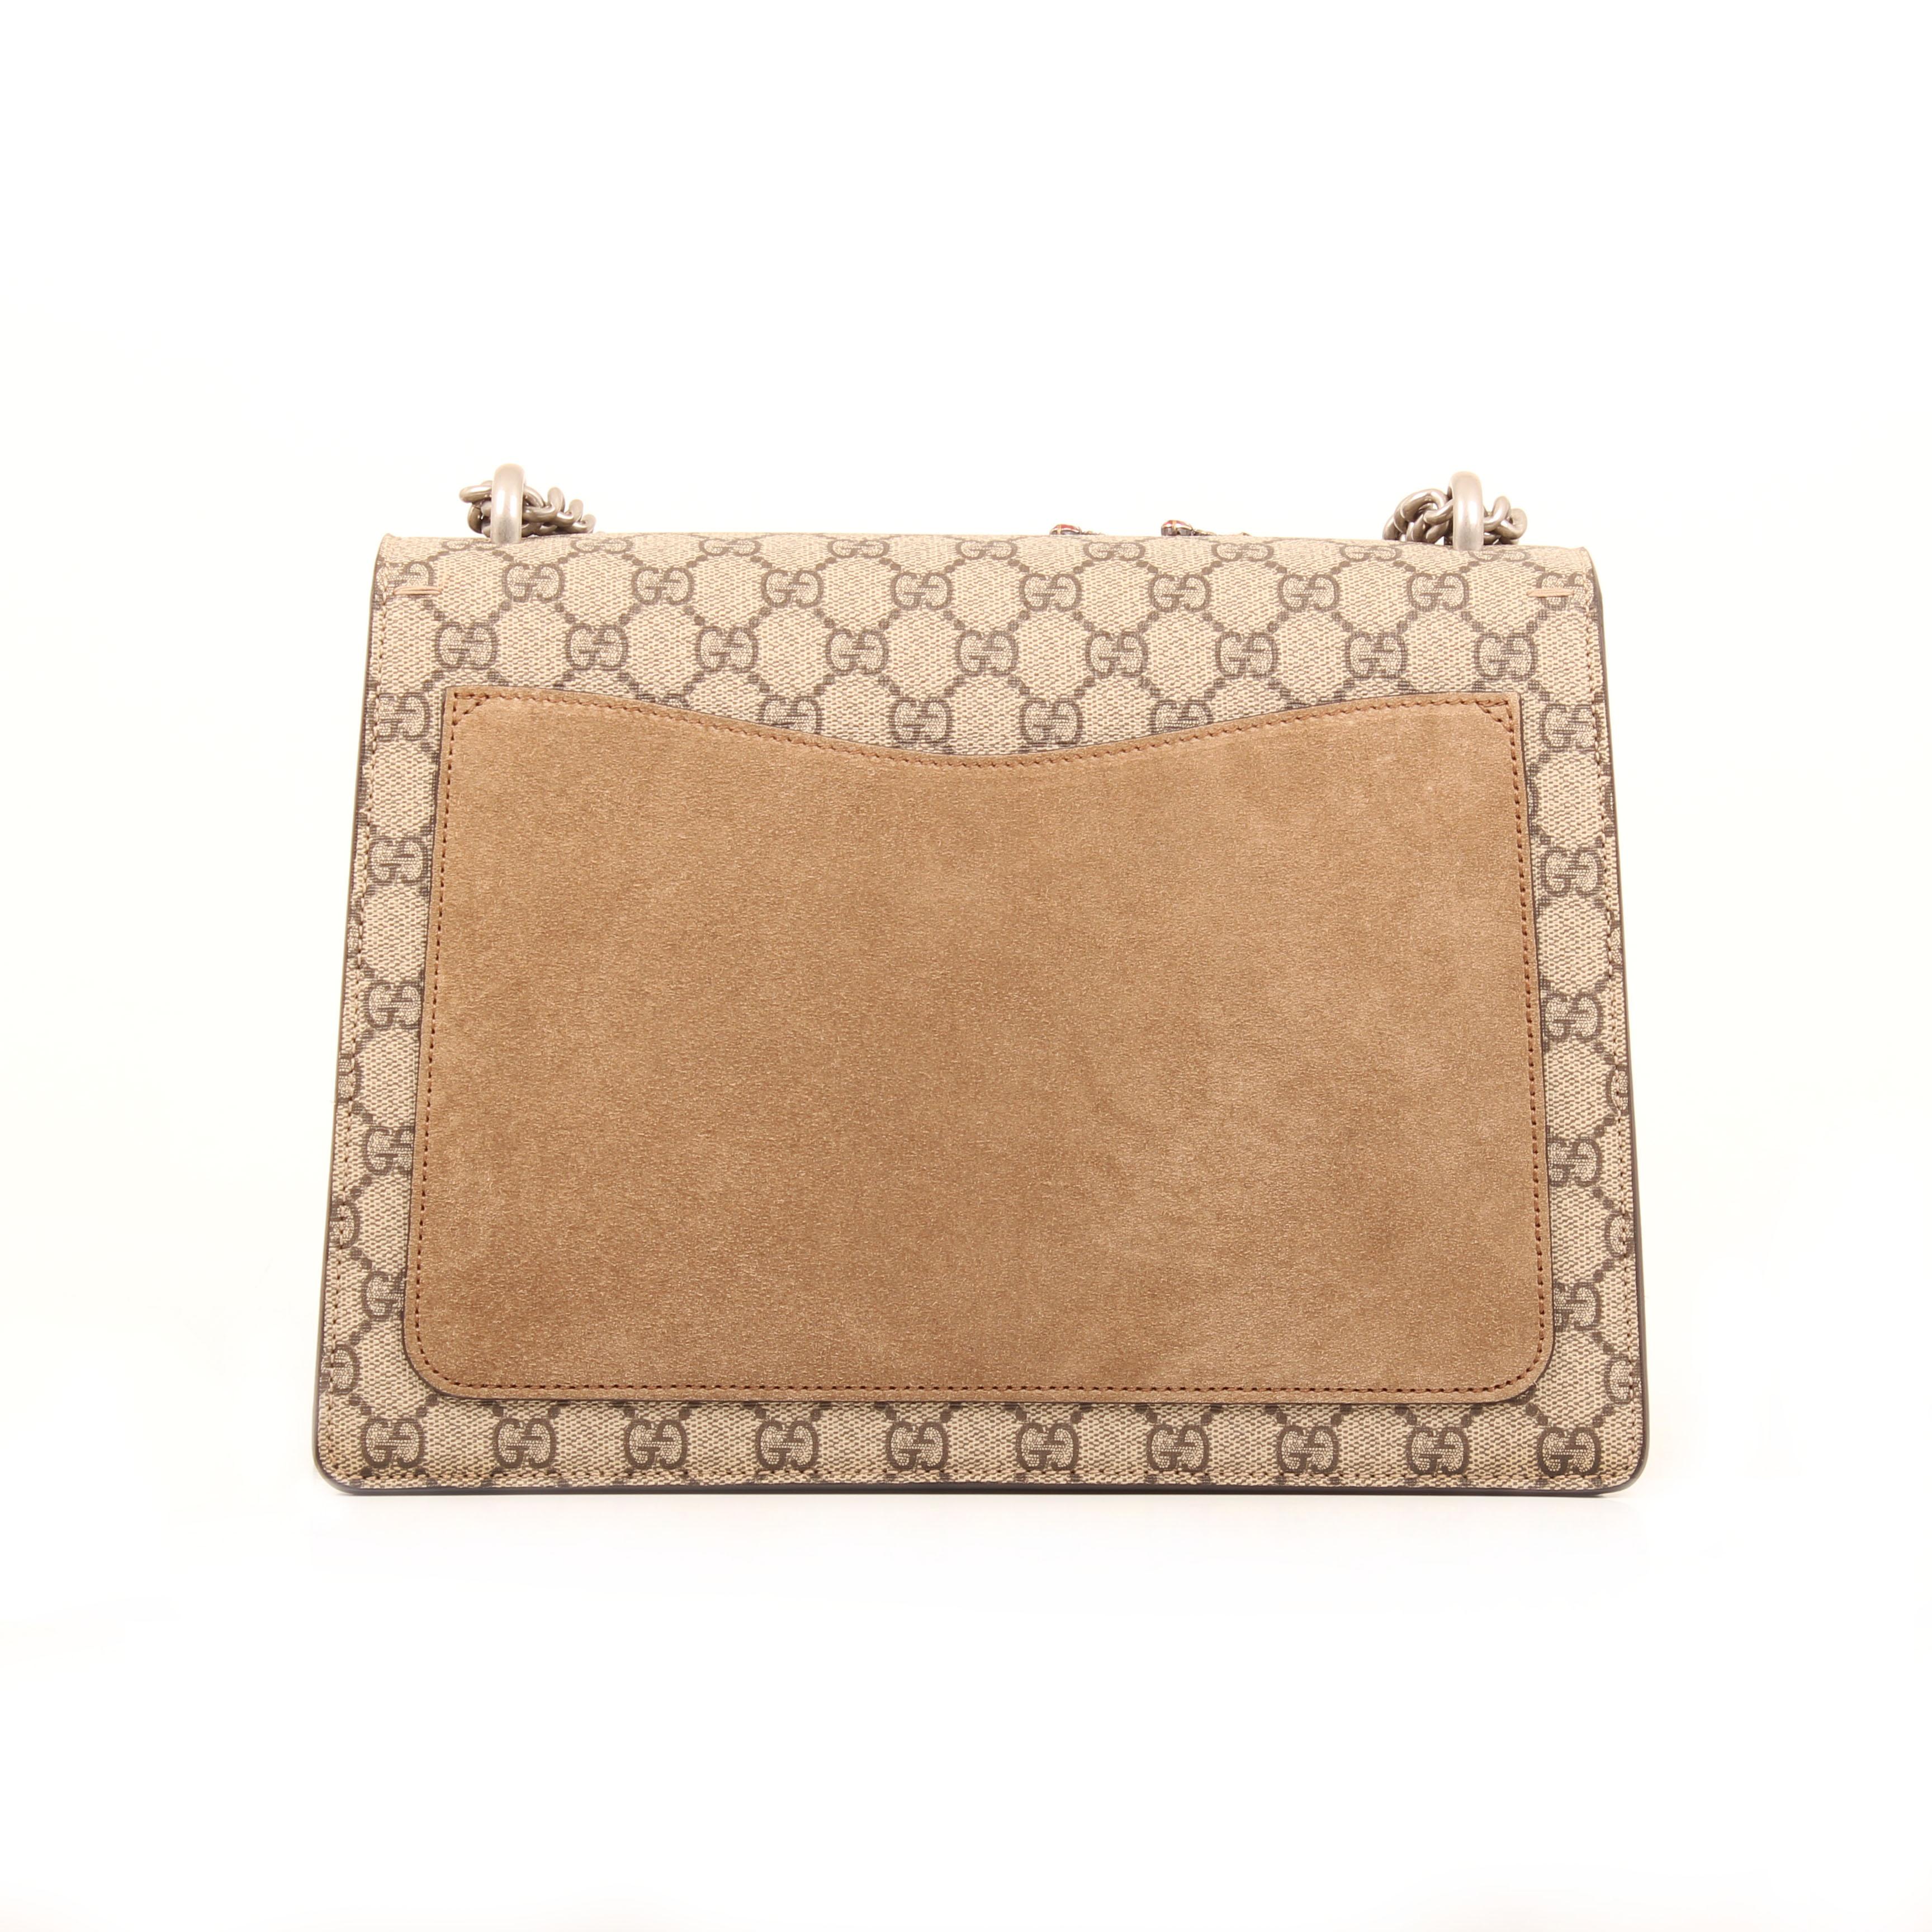 shoulder bag dionysus embroidered rhinestones suede taupe gg supreme canvas back